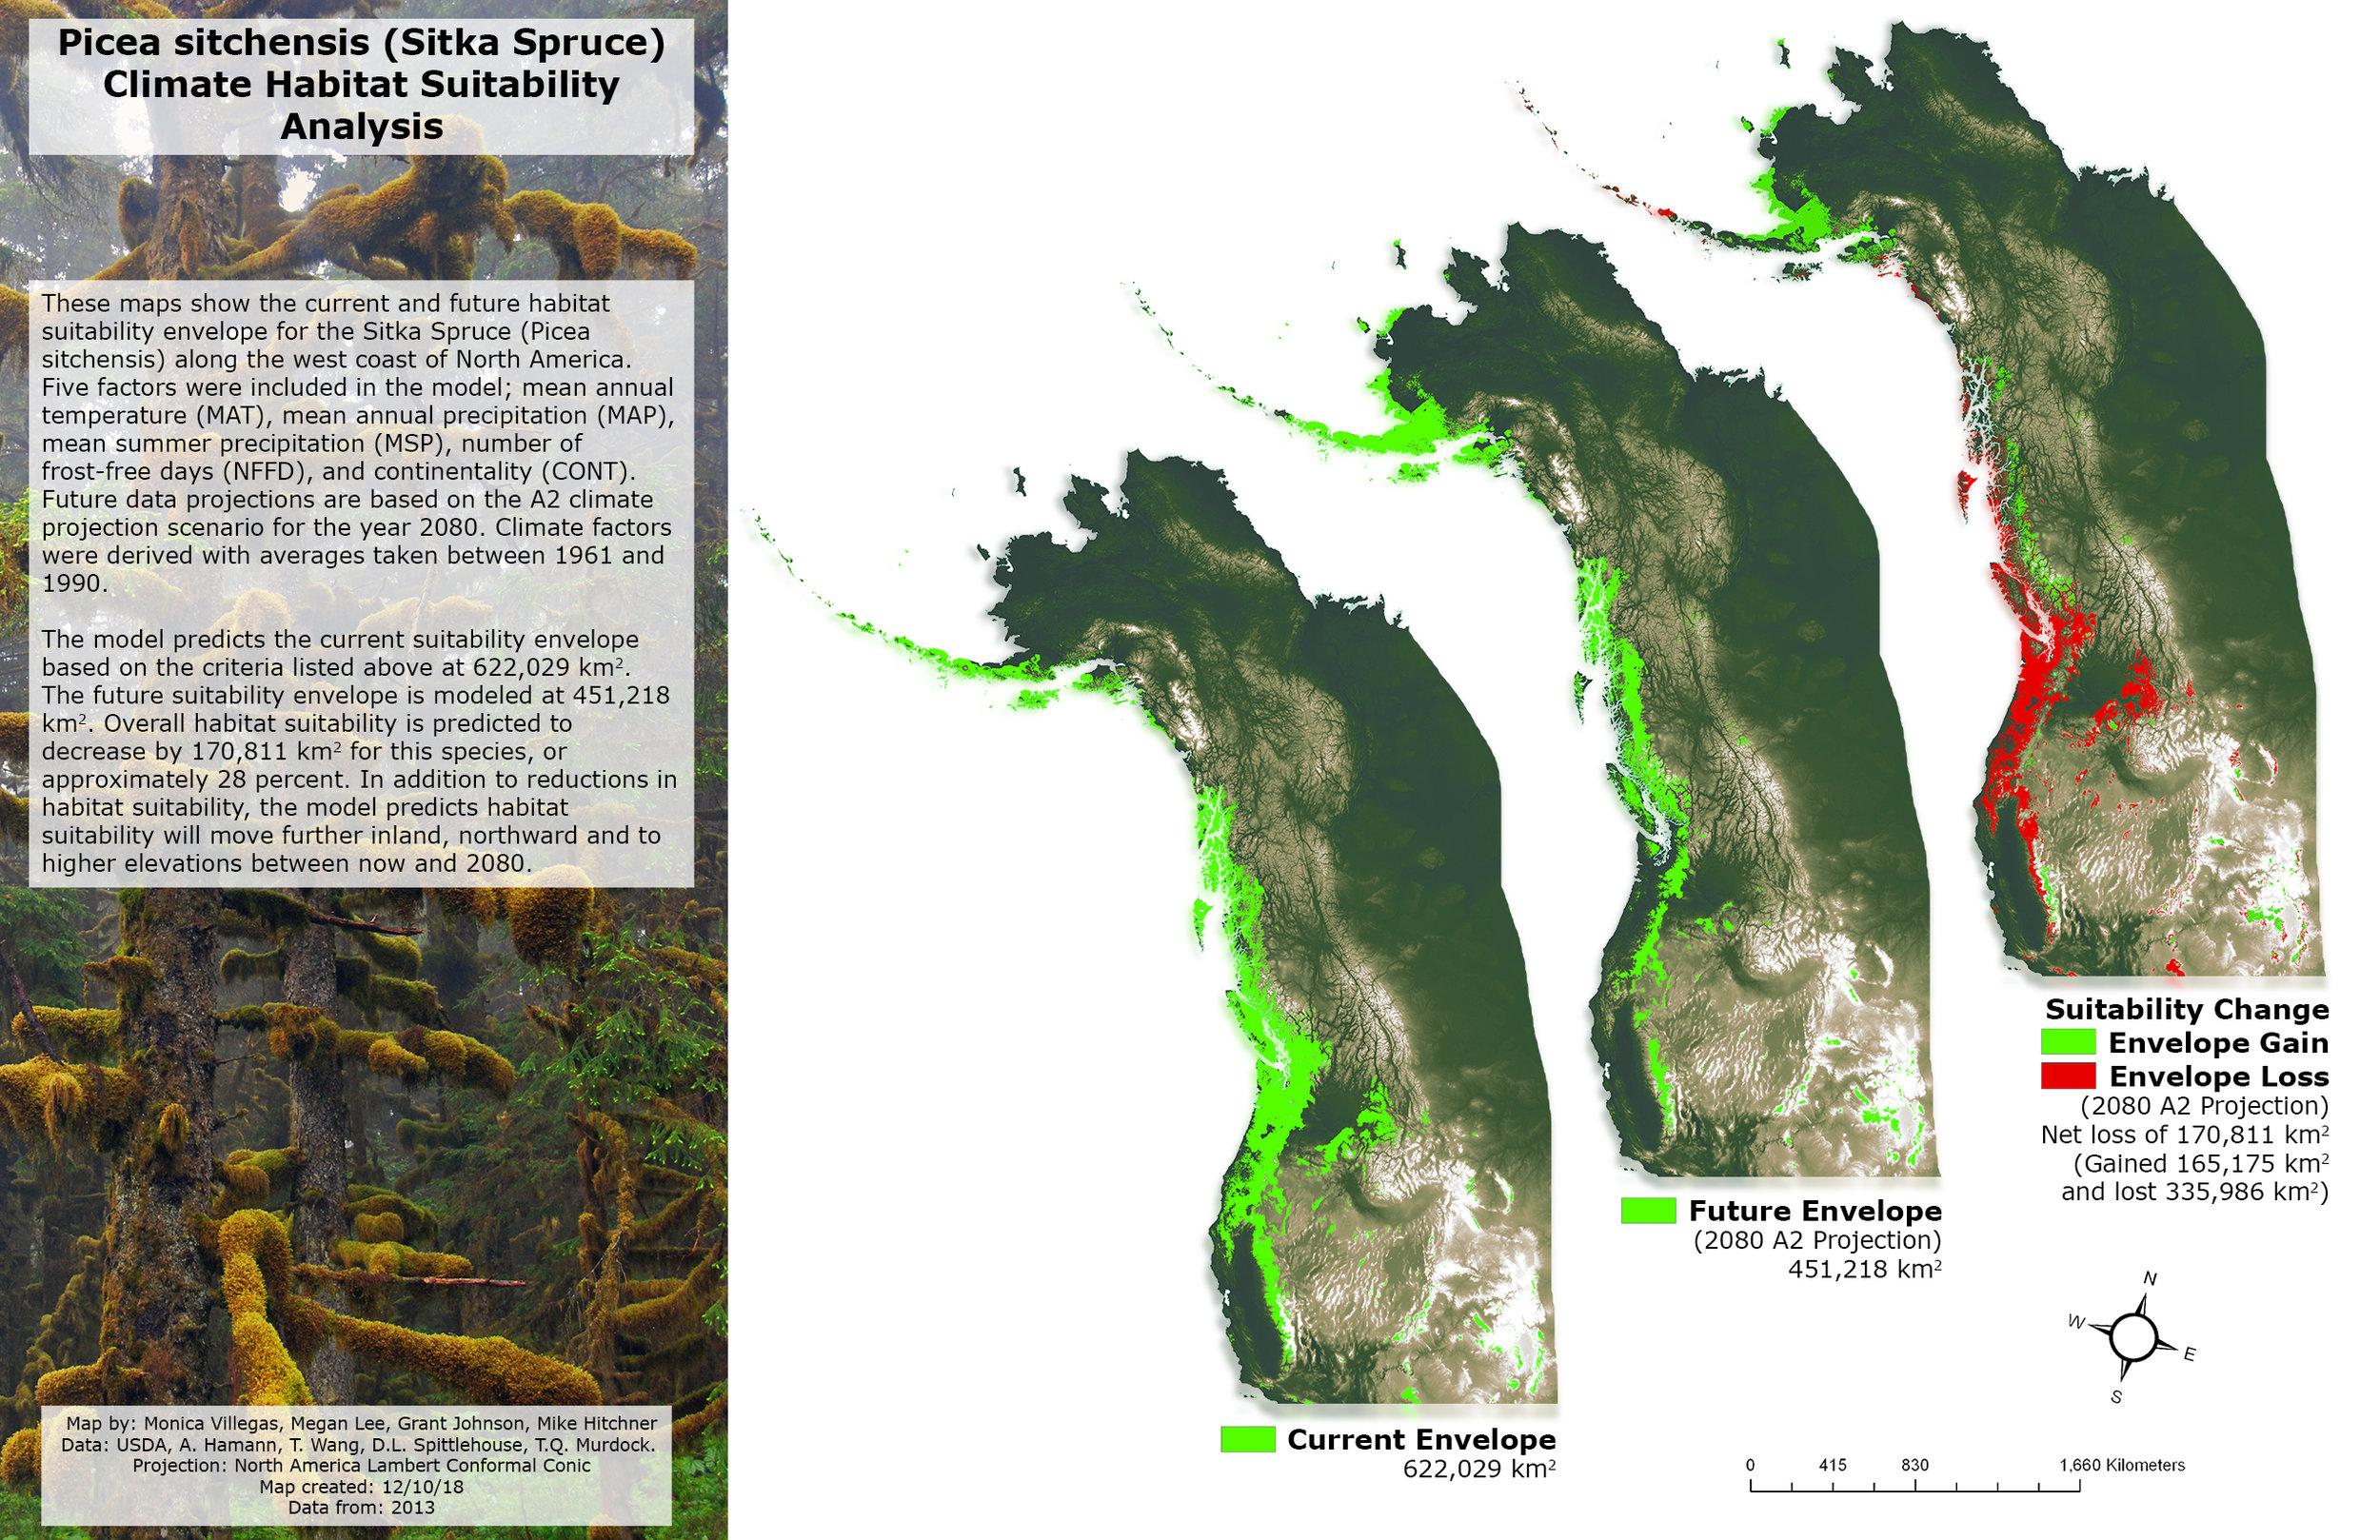 Sitka_Spruce_Climate_Habitat_Suitability_Analysis.jpg